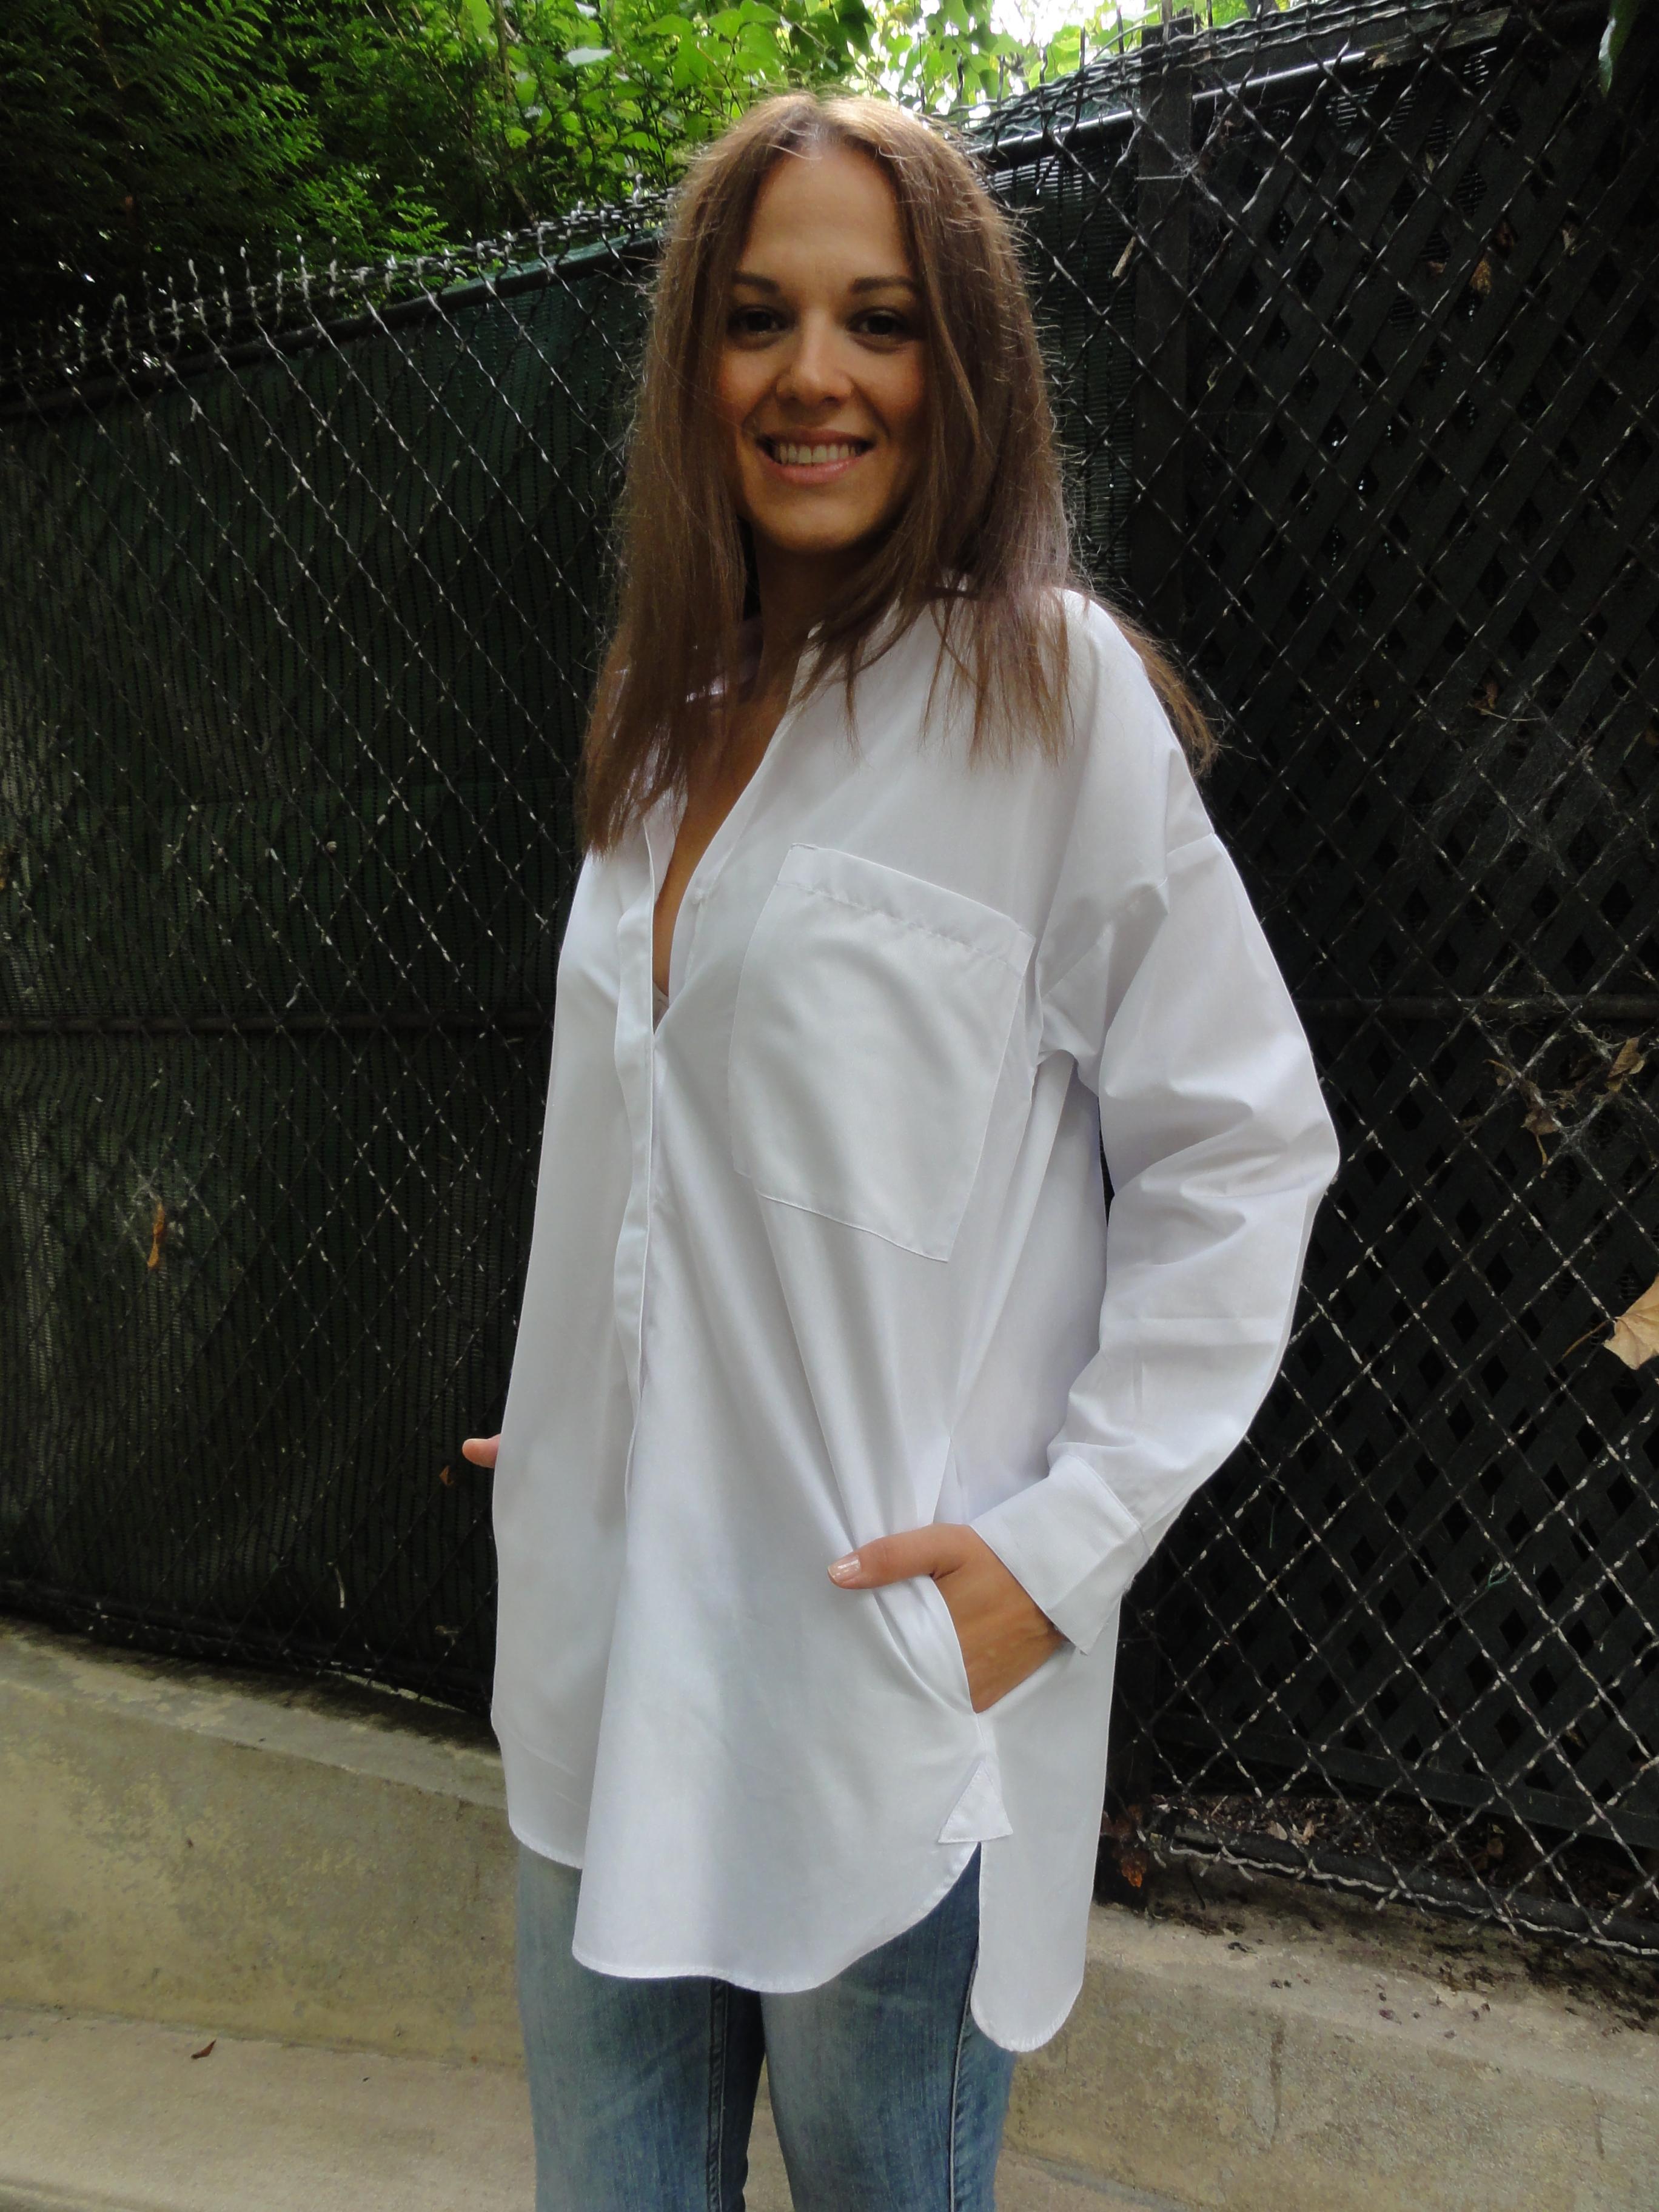 oversized shirt | THE FASHION MARIONNETTE